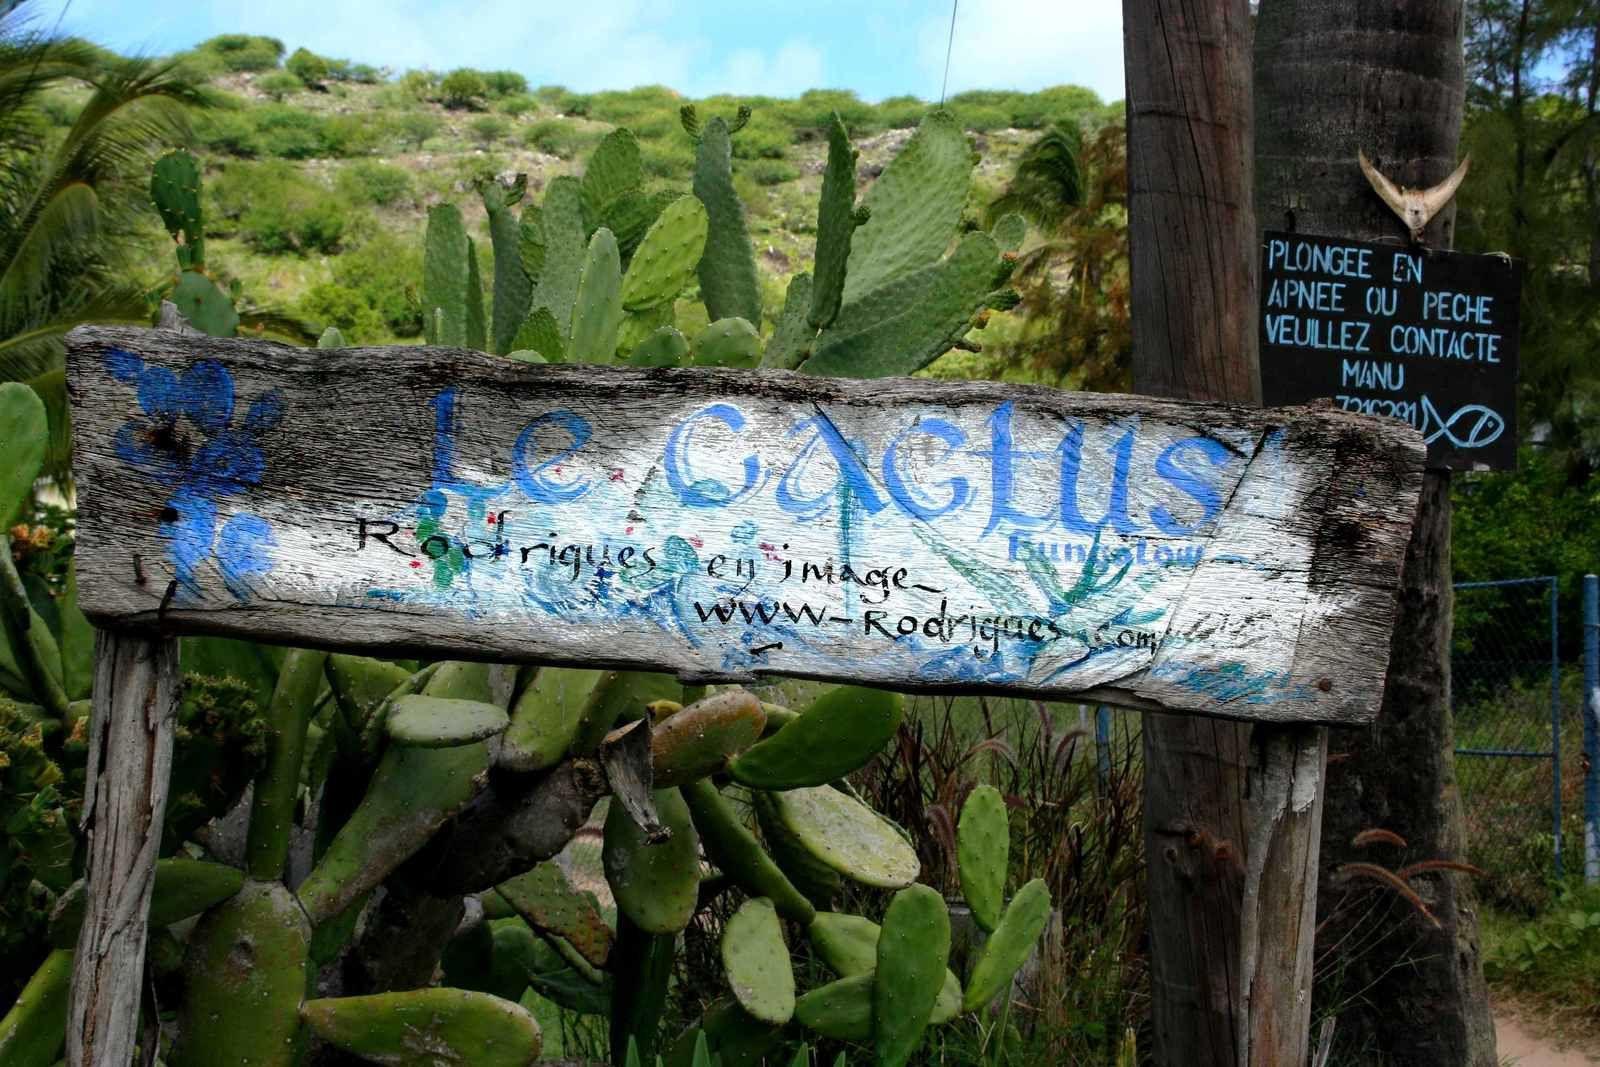 236 - L'île Rodrigues 03, géolocalisation, Le Cactus, Fabrina, Dary, Grand-Baie, Océan Indien, photos GeoMar